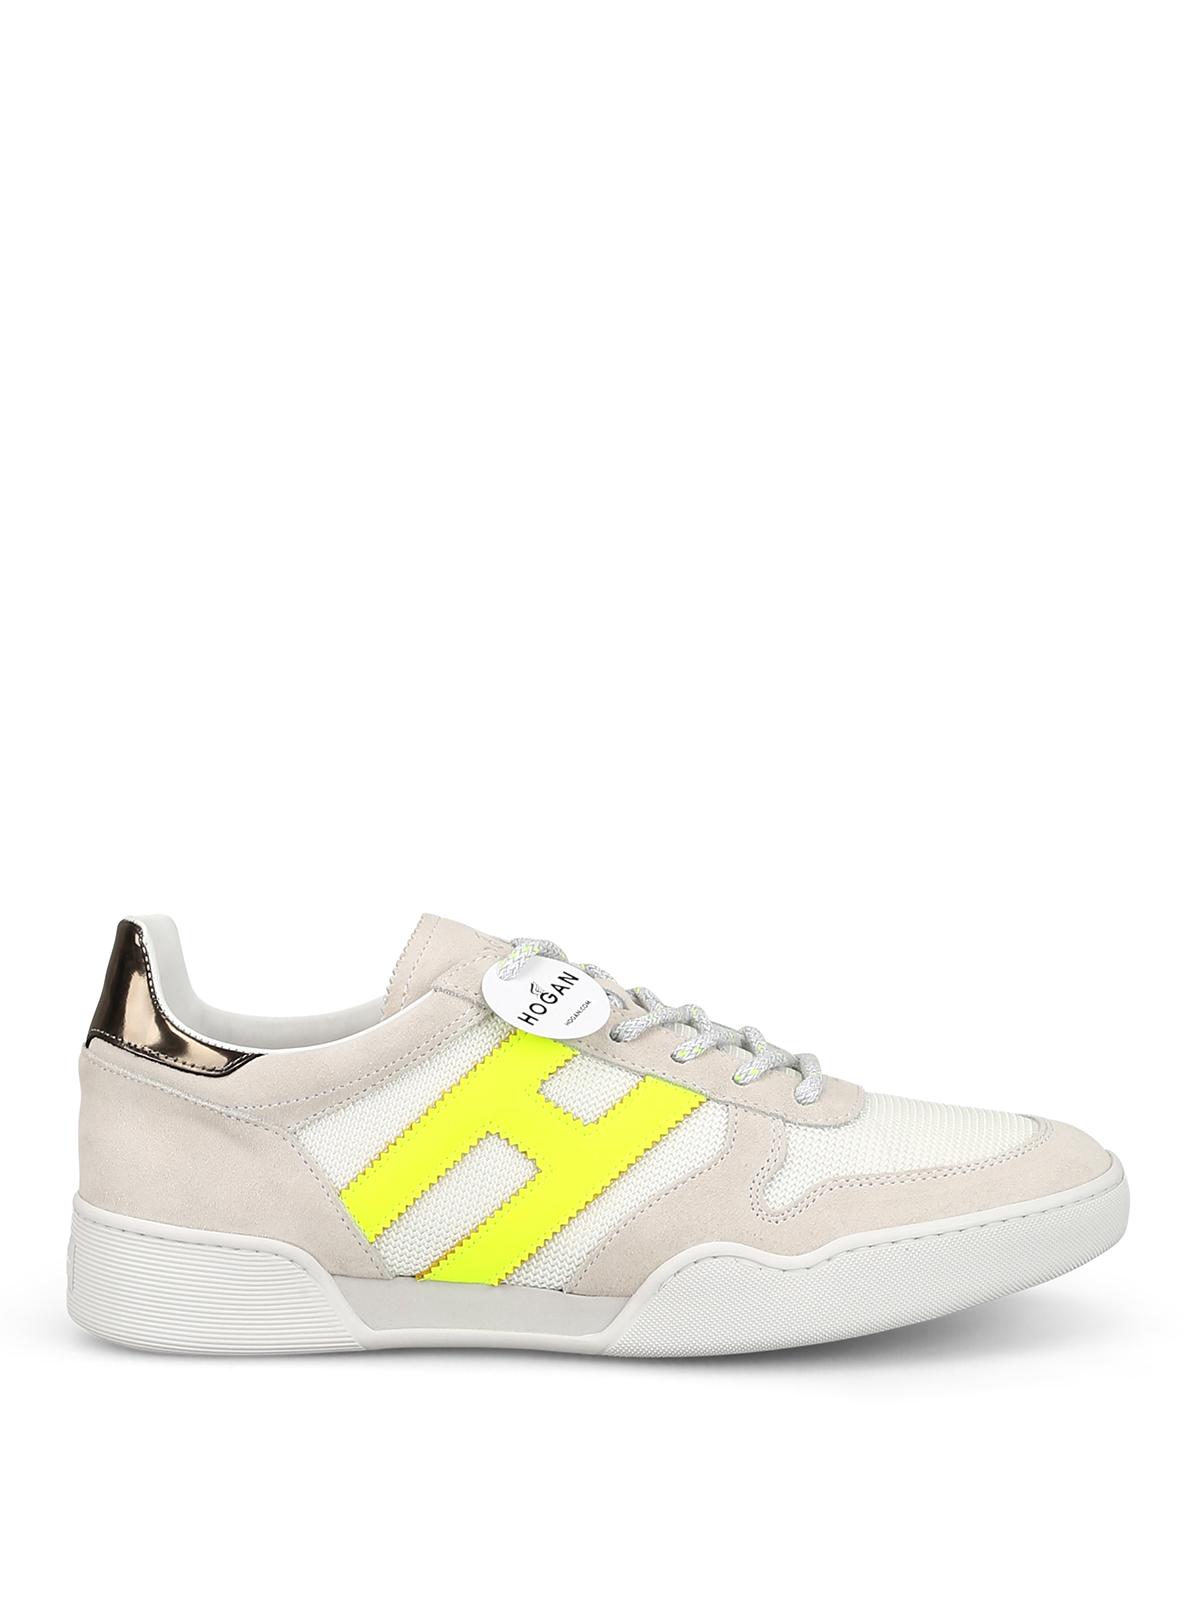 Sneakers Hogan - Sneaker H357 con H fluo - HXM3570AC42KF76EDN ...